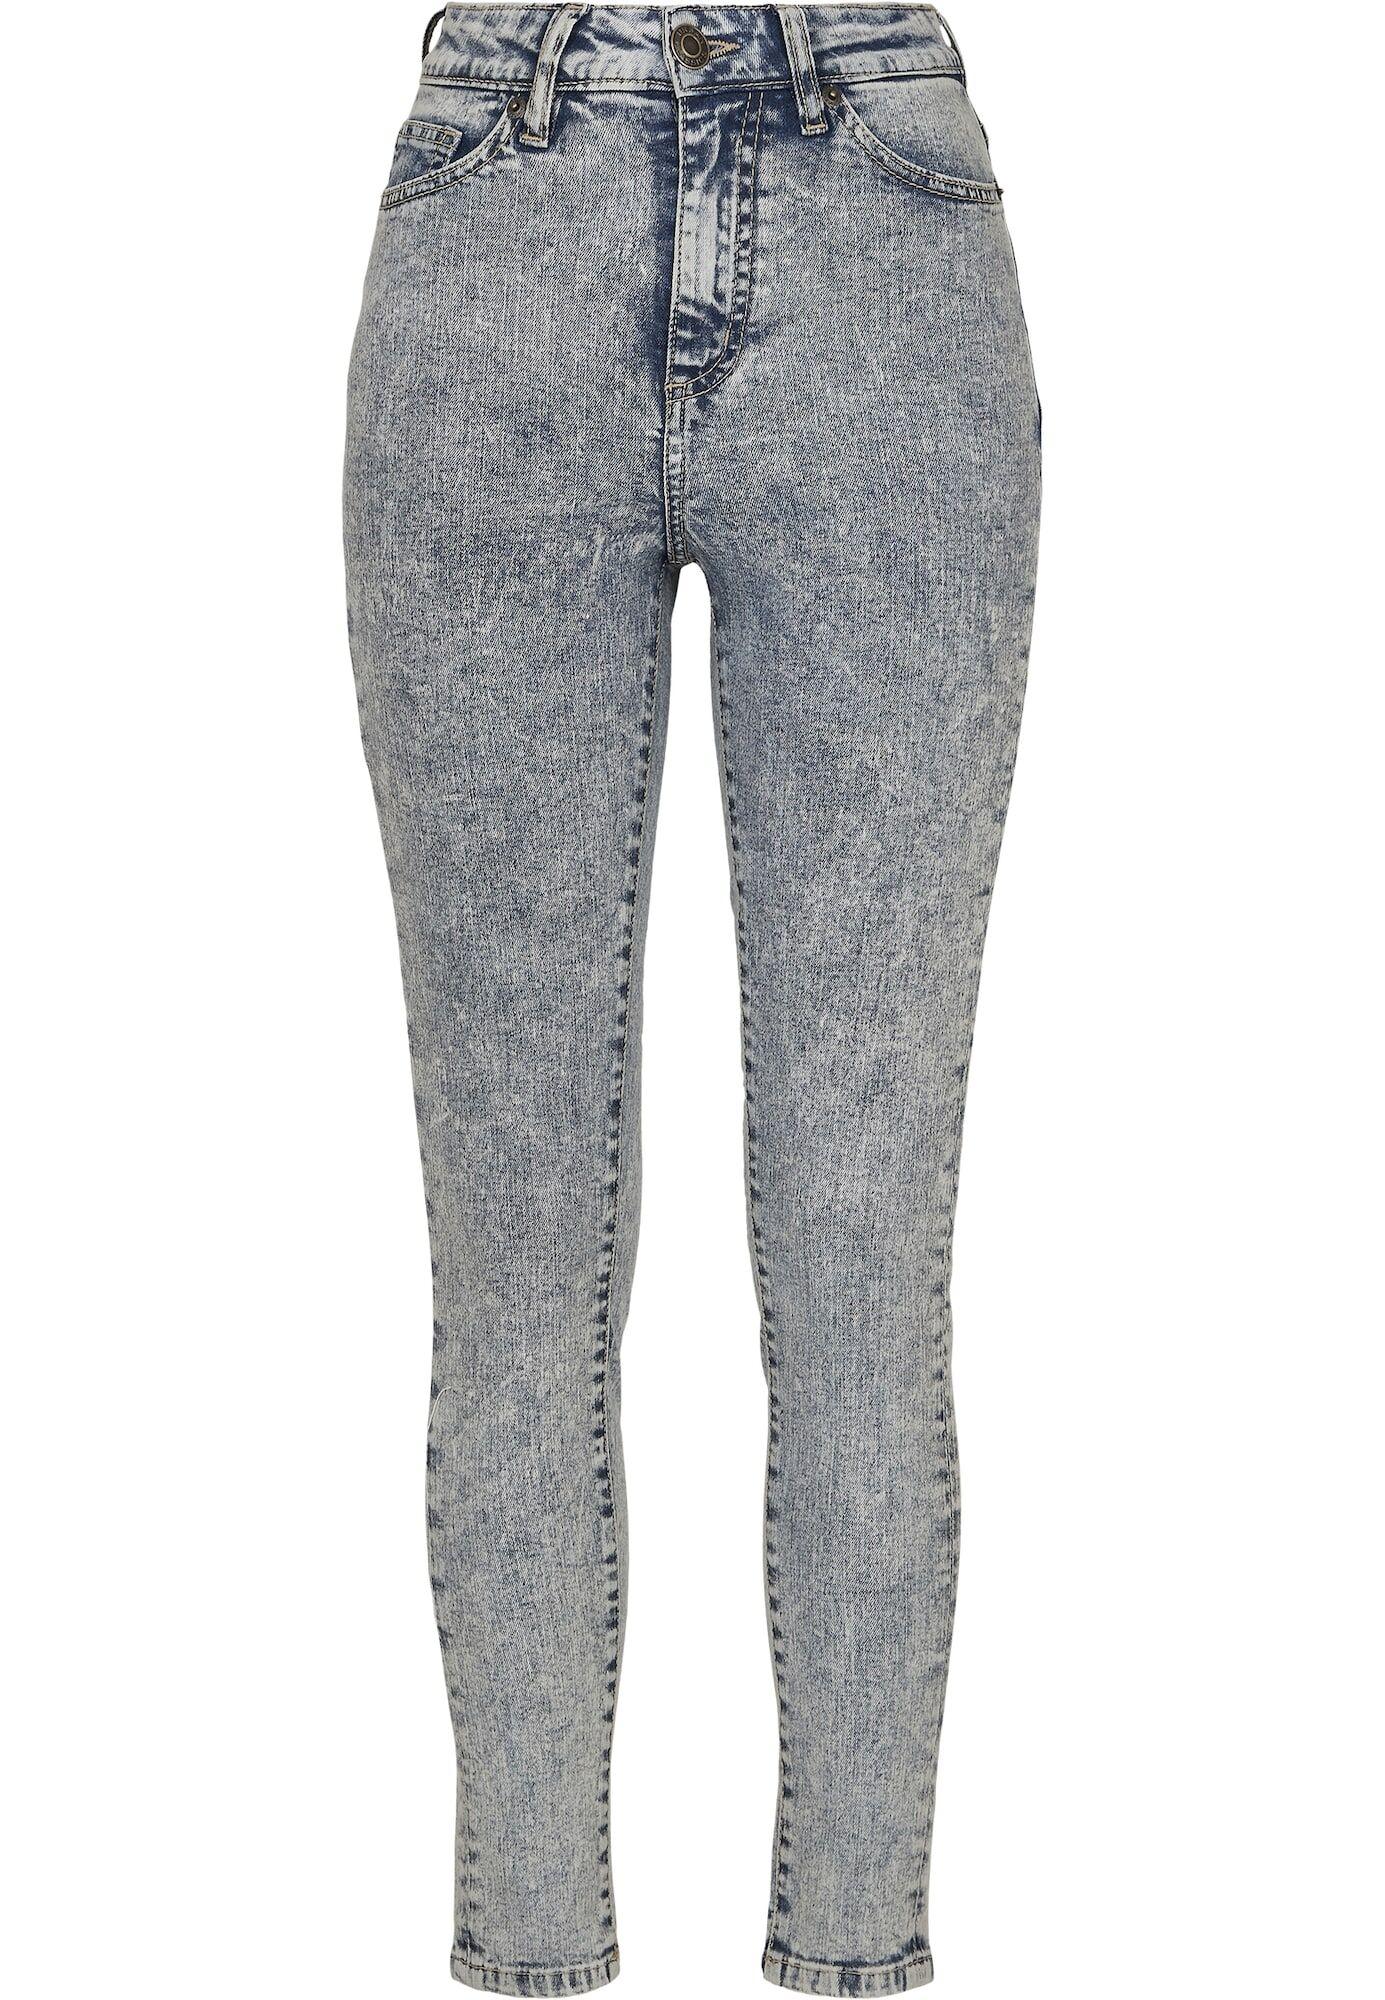 Urban Classics Jean  - Bleu - Taille: 28 - female